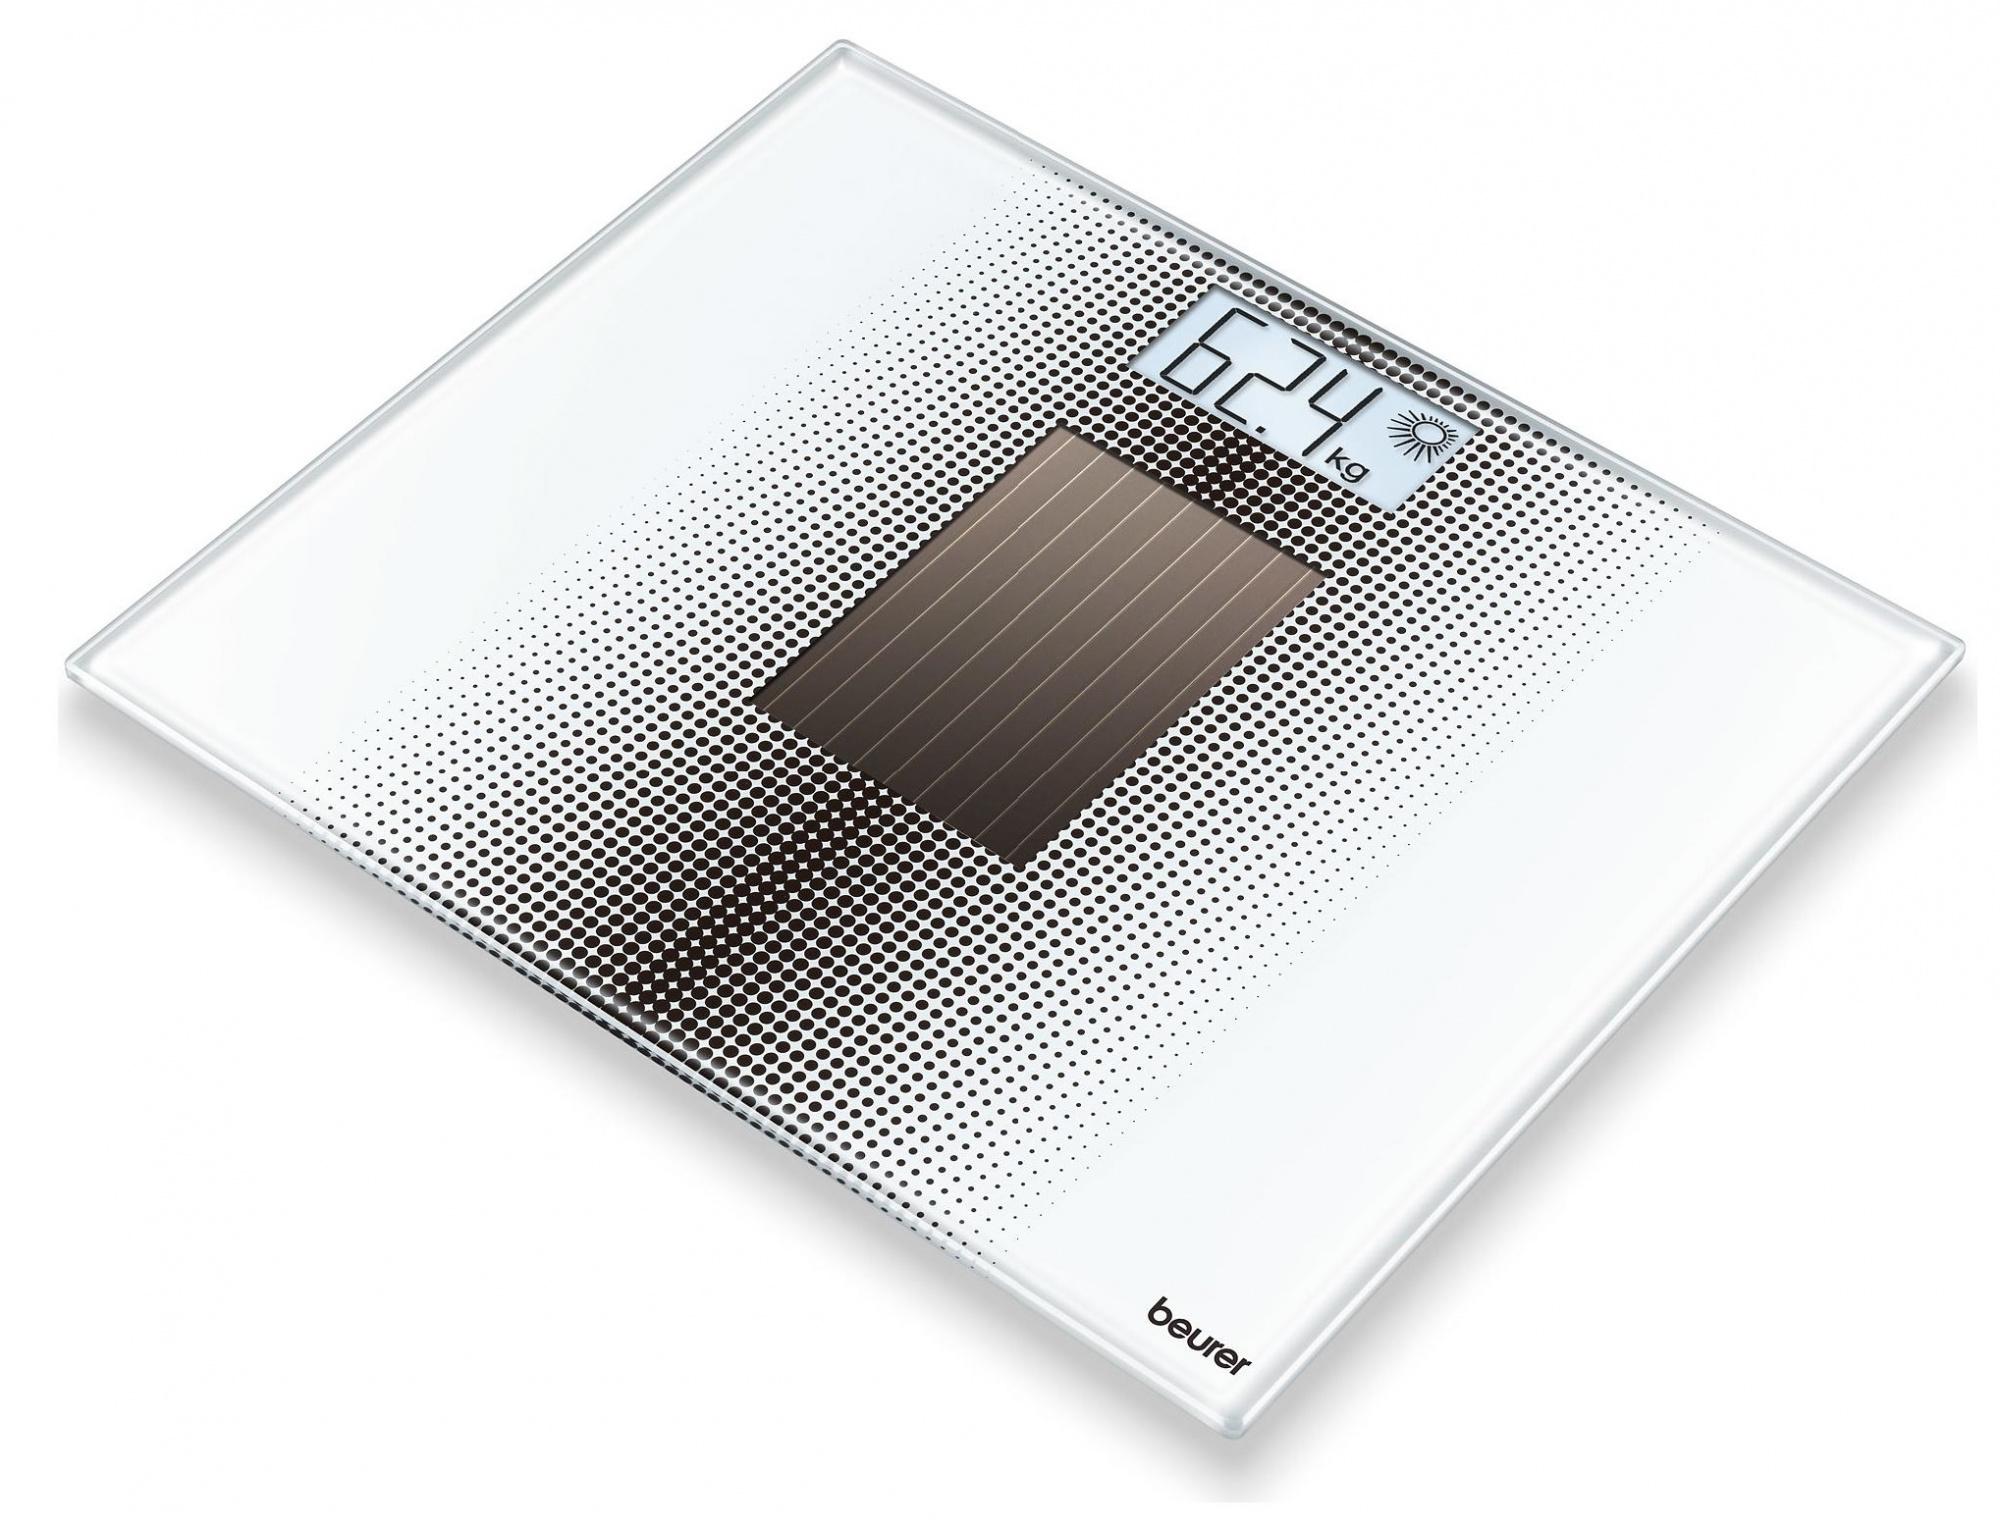 Beurer GS41 Solar - напольные весы (Beige)Весы напольные<br>Весы напольные<br>